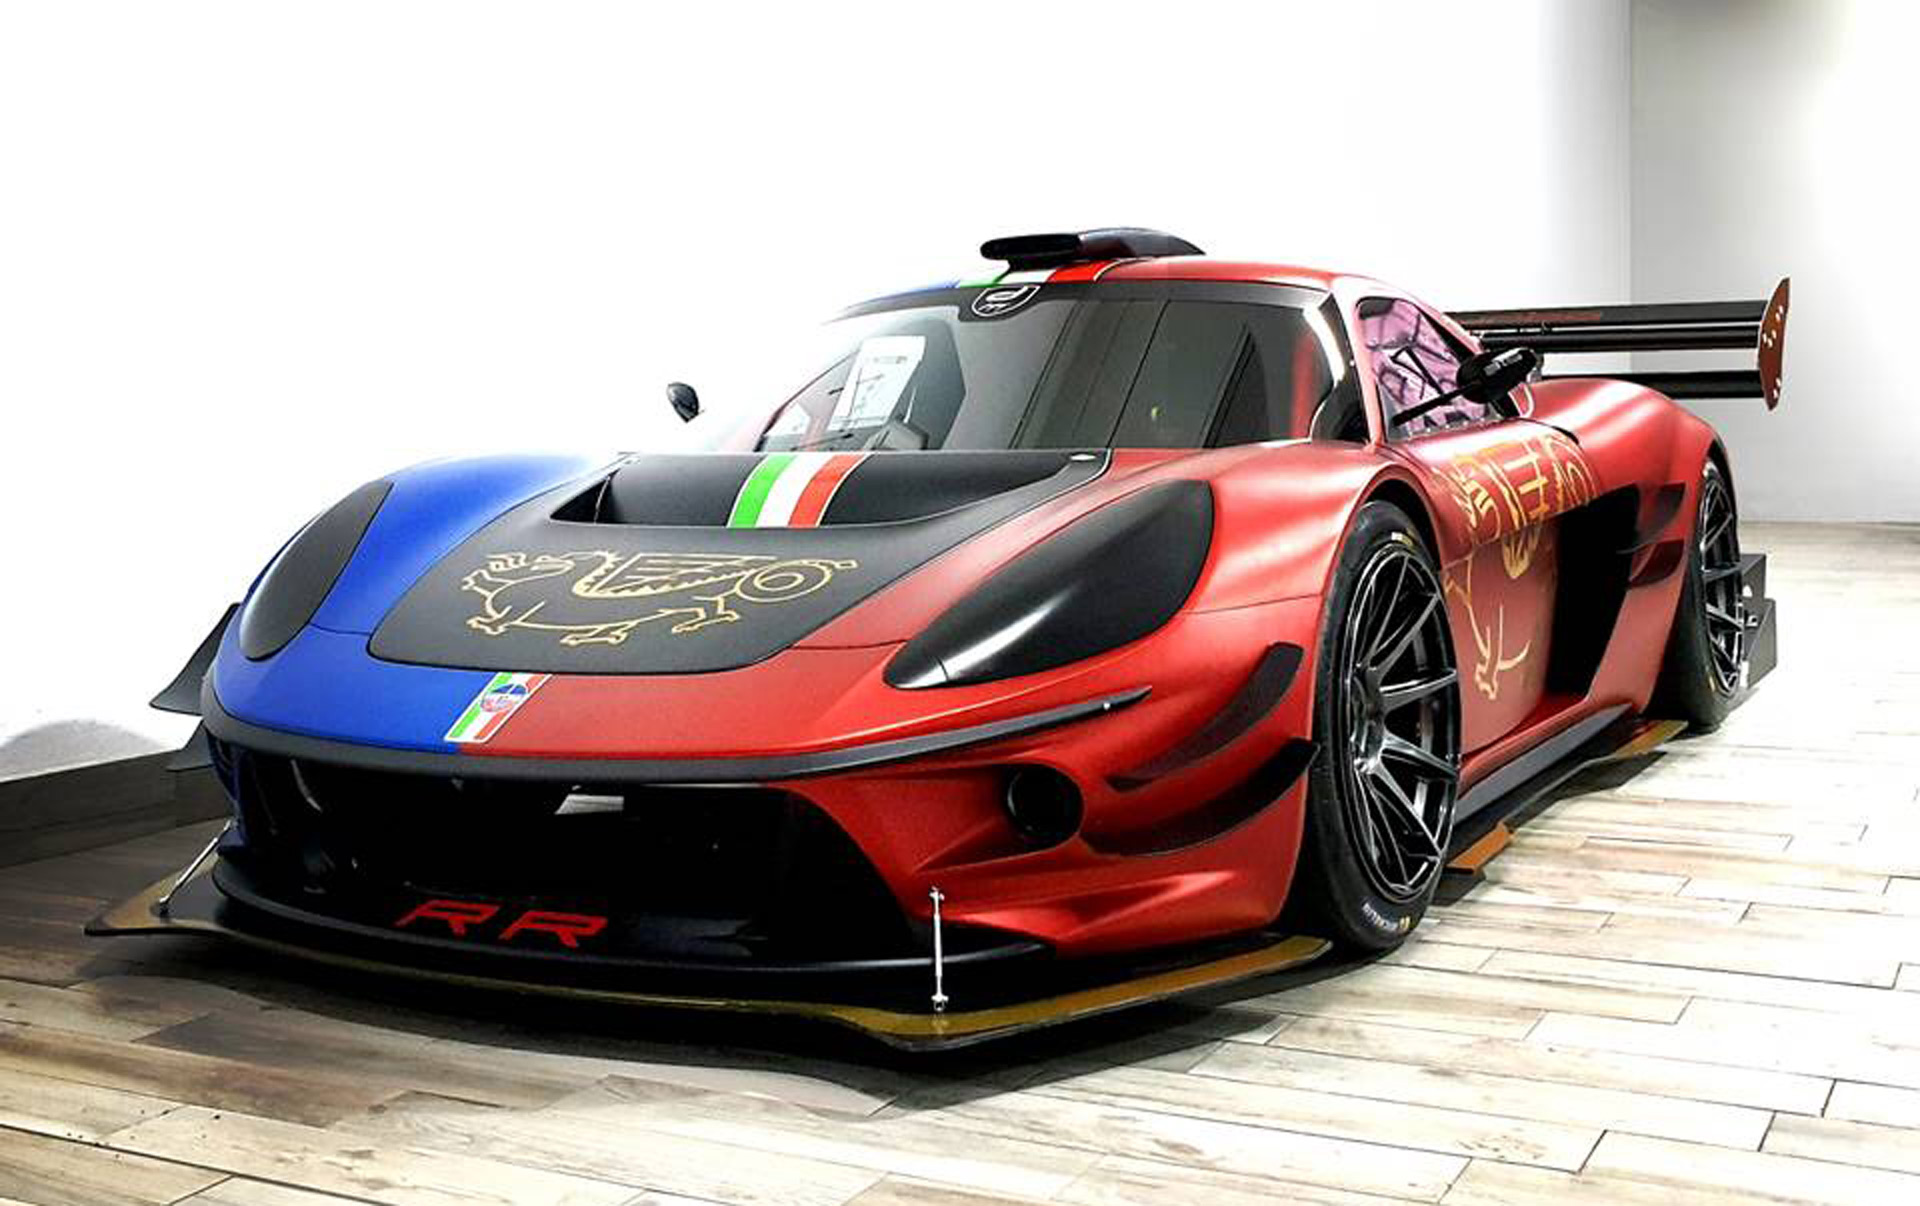 ATS RR Turbo: Historic Italian brand's new race car priced under $150,000